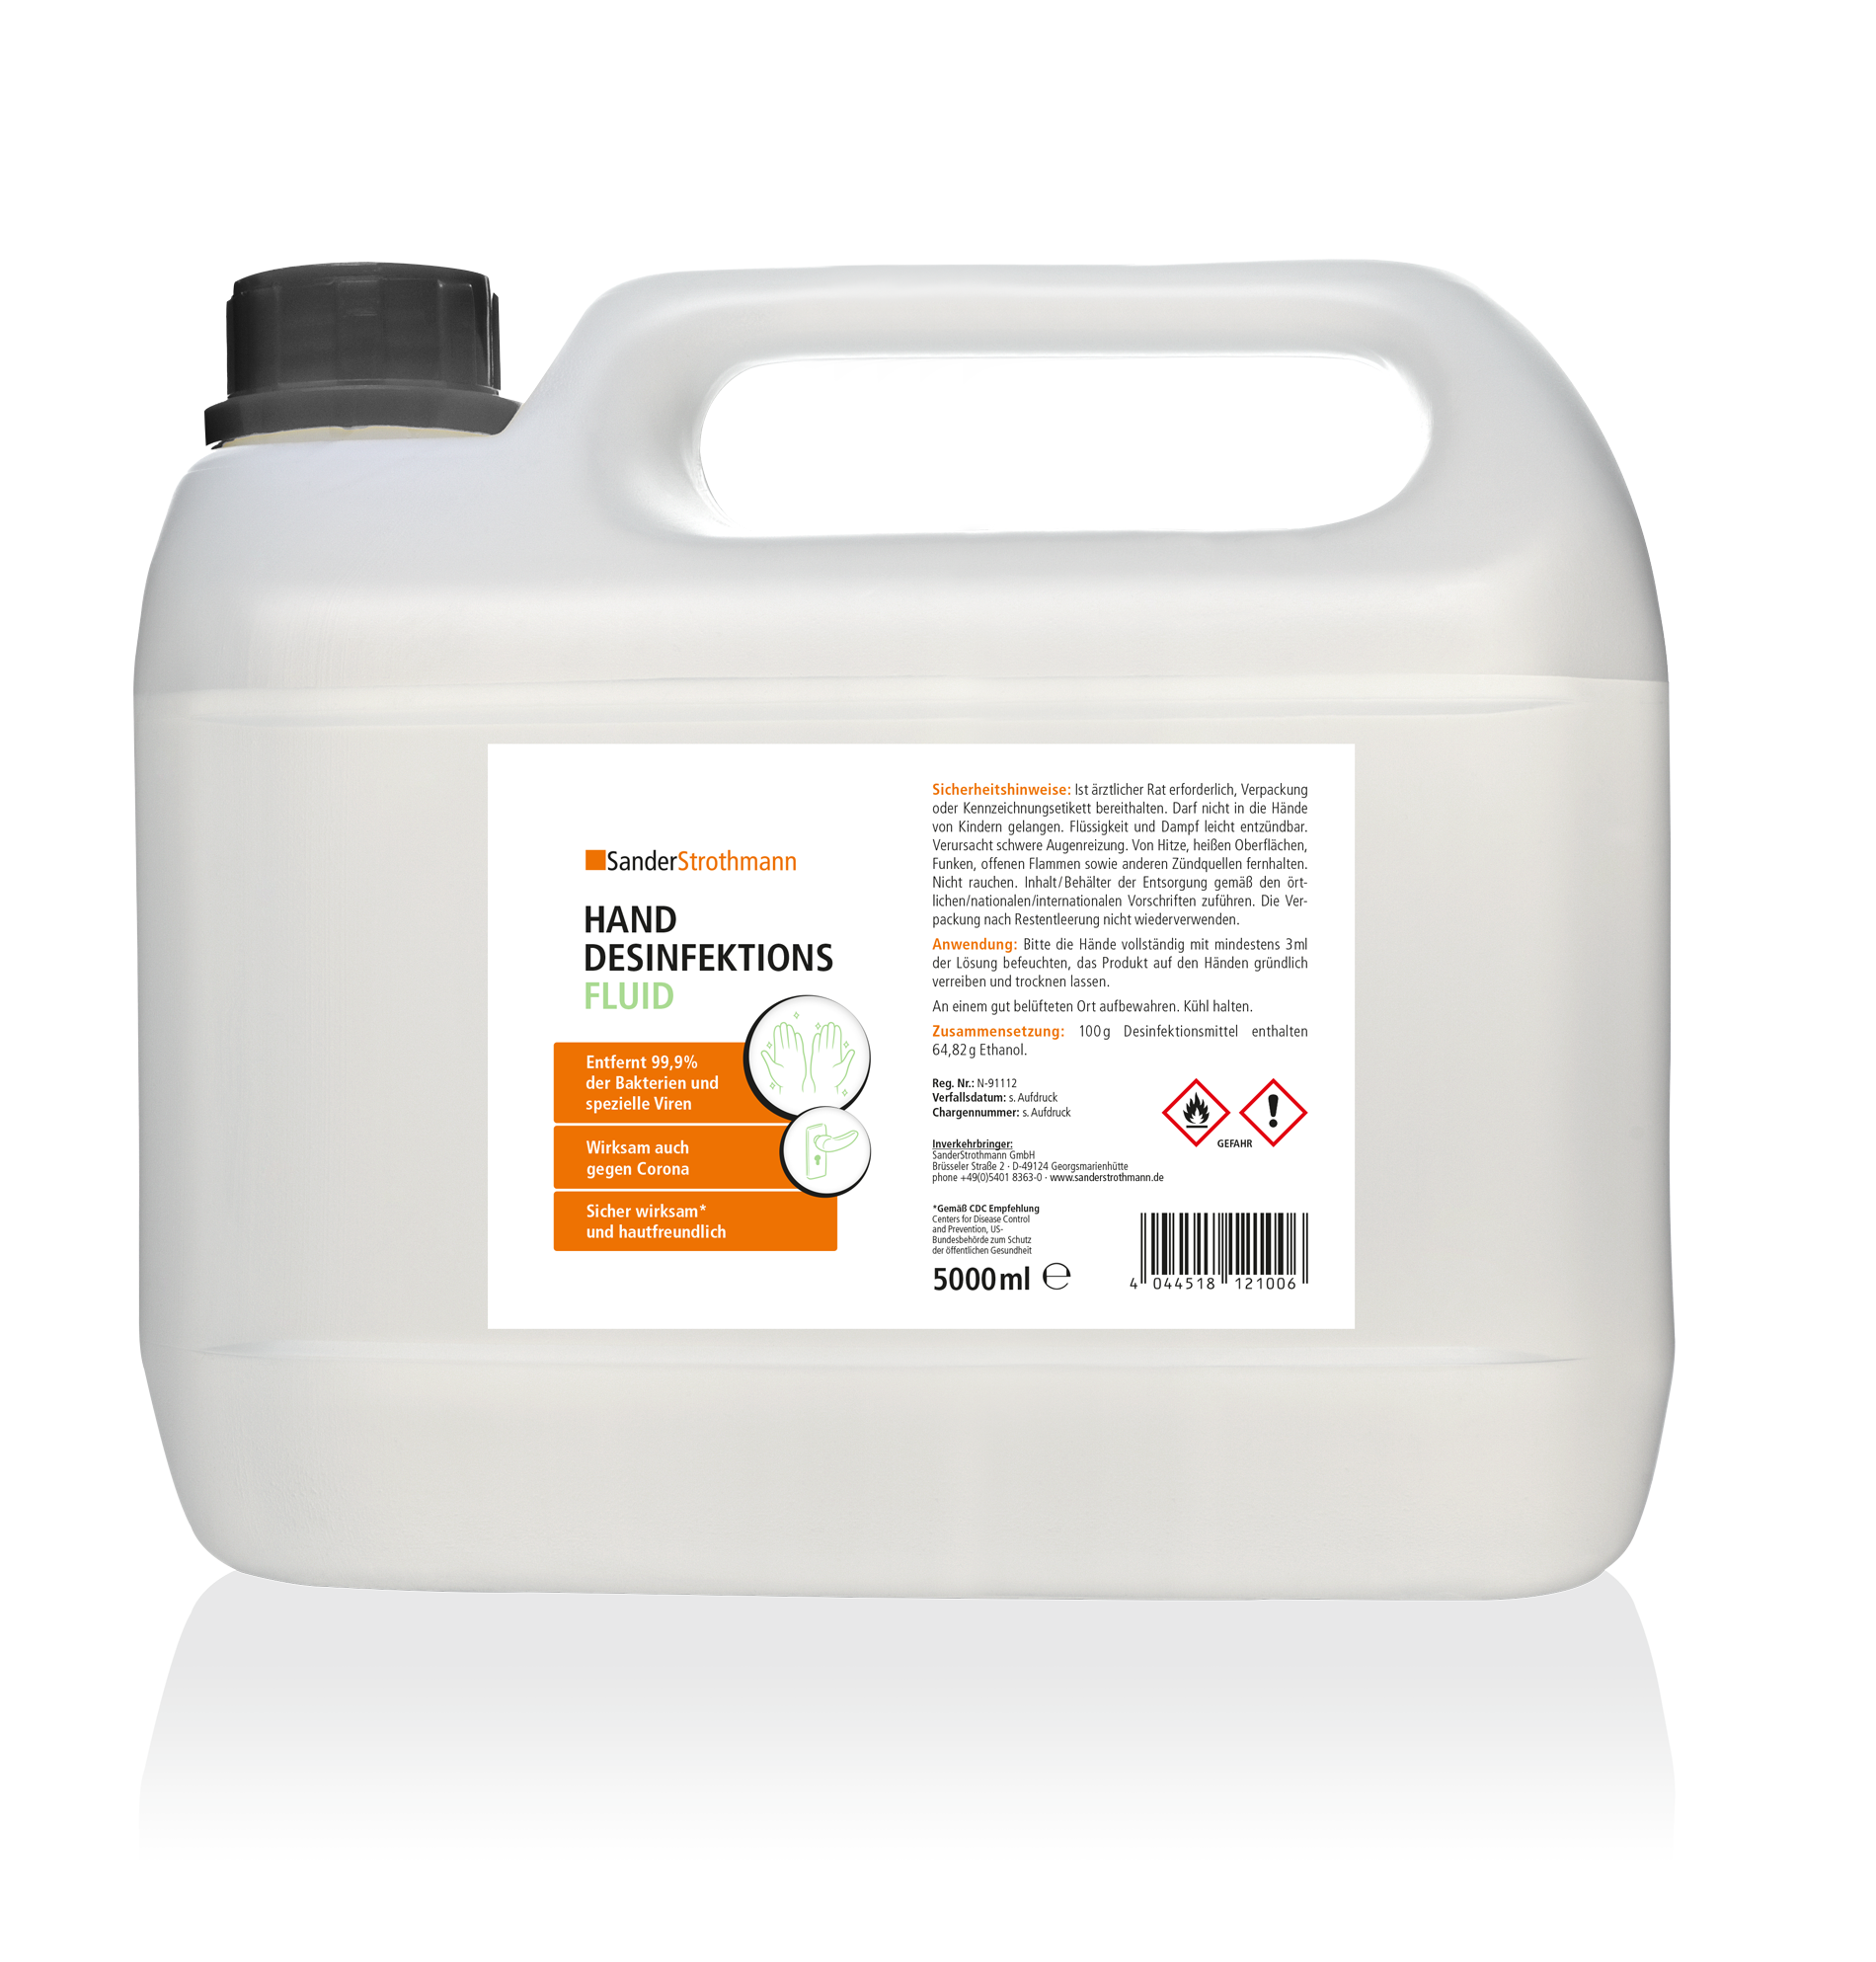 Desinfektionmittel flüssig 5 Liter Kanister